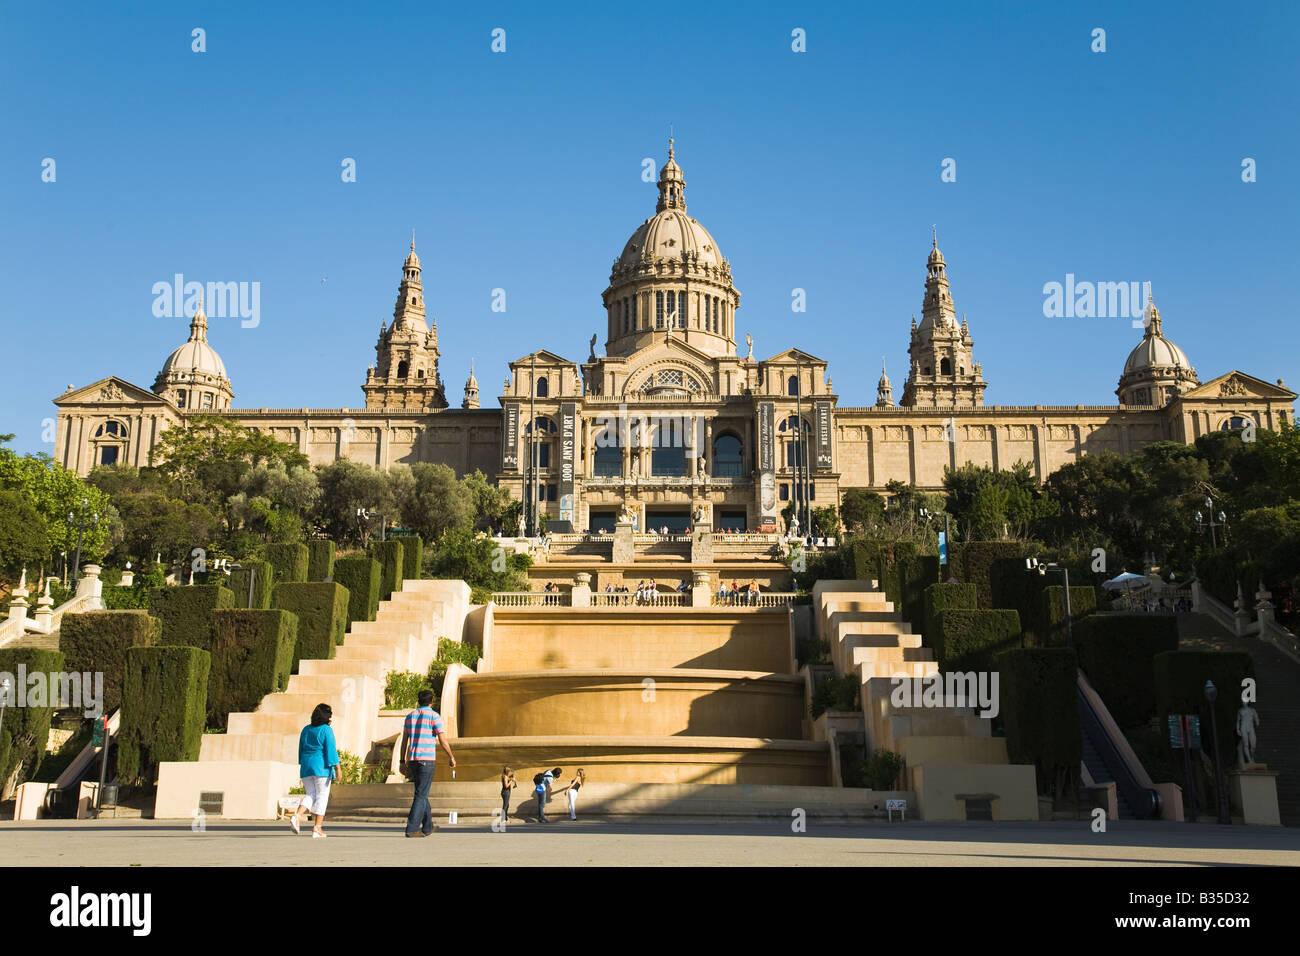 SPAIN Barcelona Exterior of Catalan Art Museum fountains turned off due to drought Museu Nacional d Arte de Catalunya - Stock Image